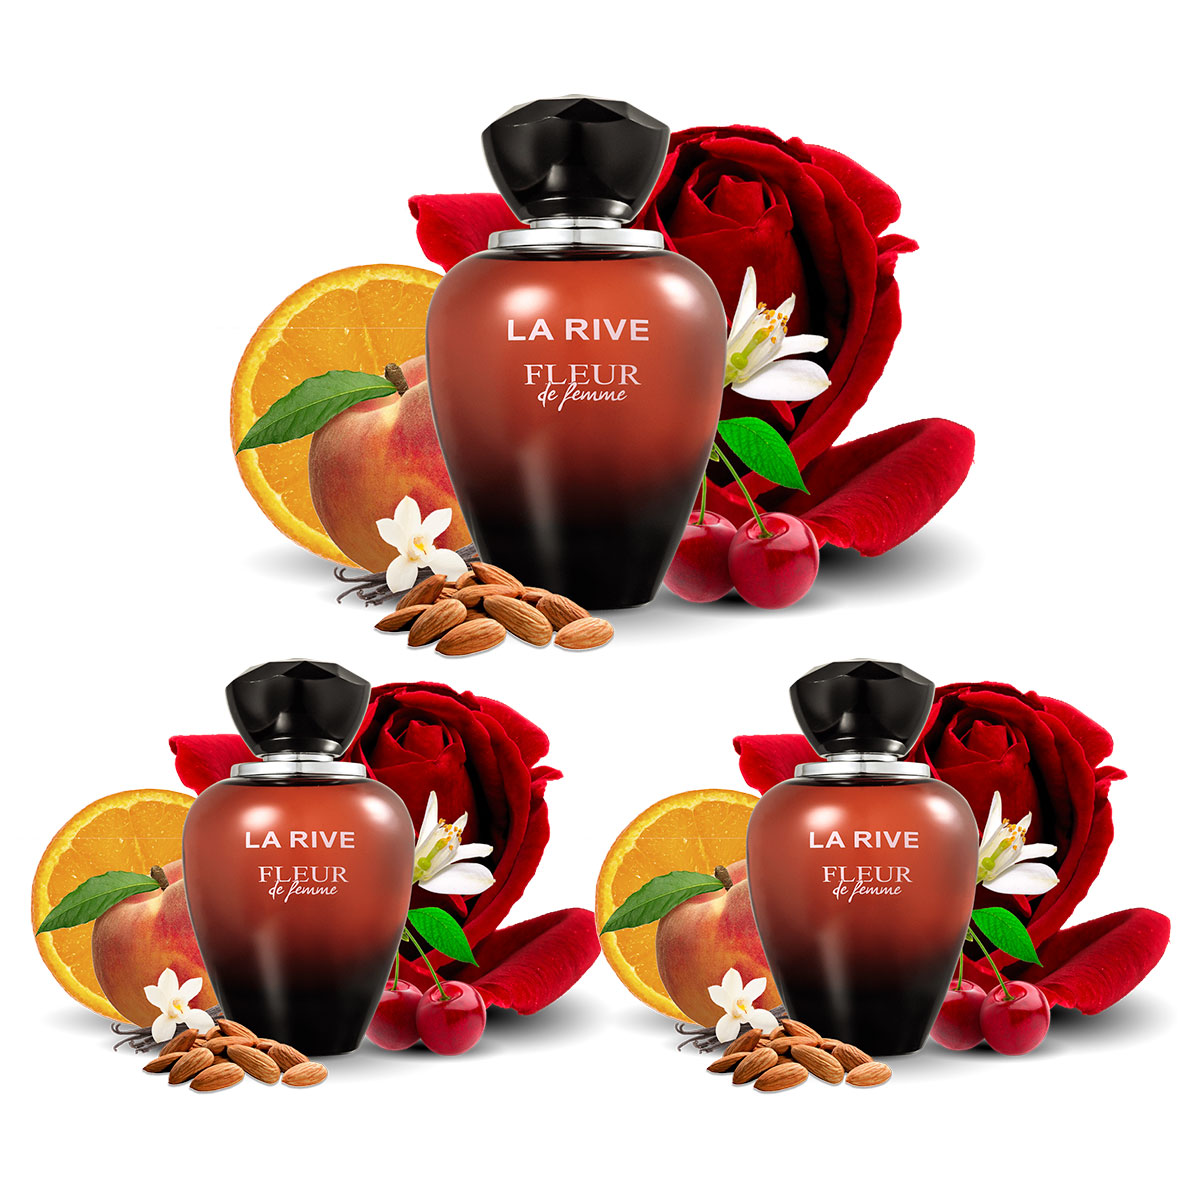 Kit 3 Perfumes Importados Feminino Fleur de Femme La Rive